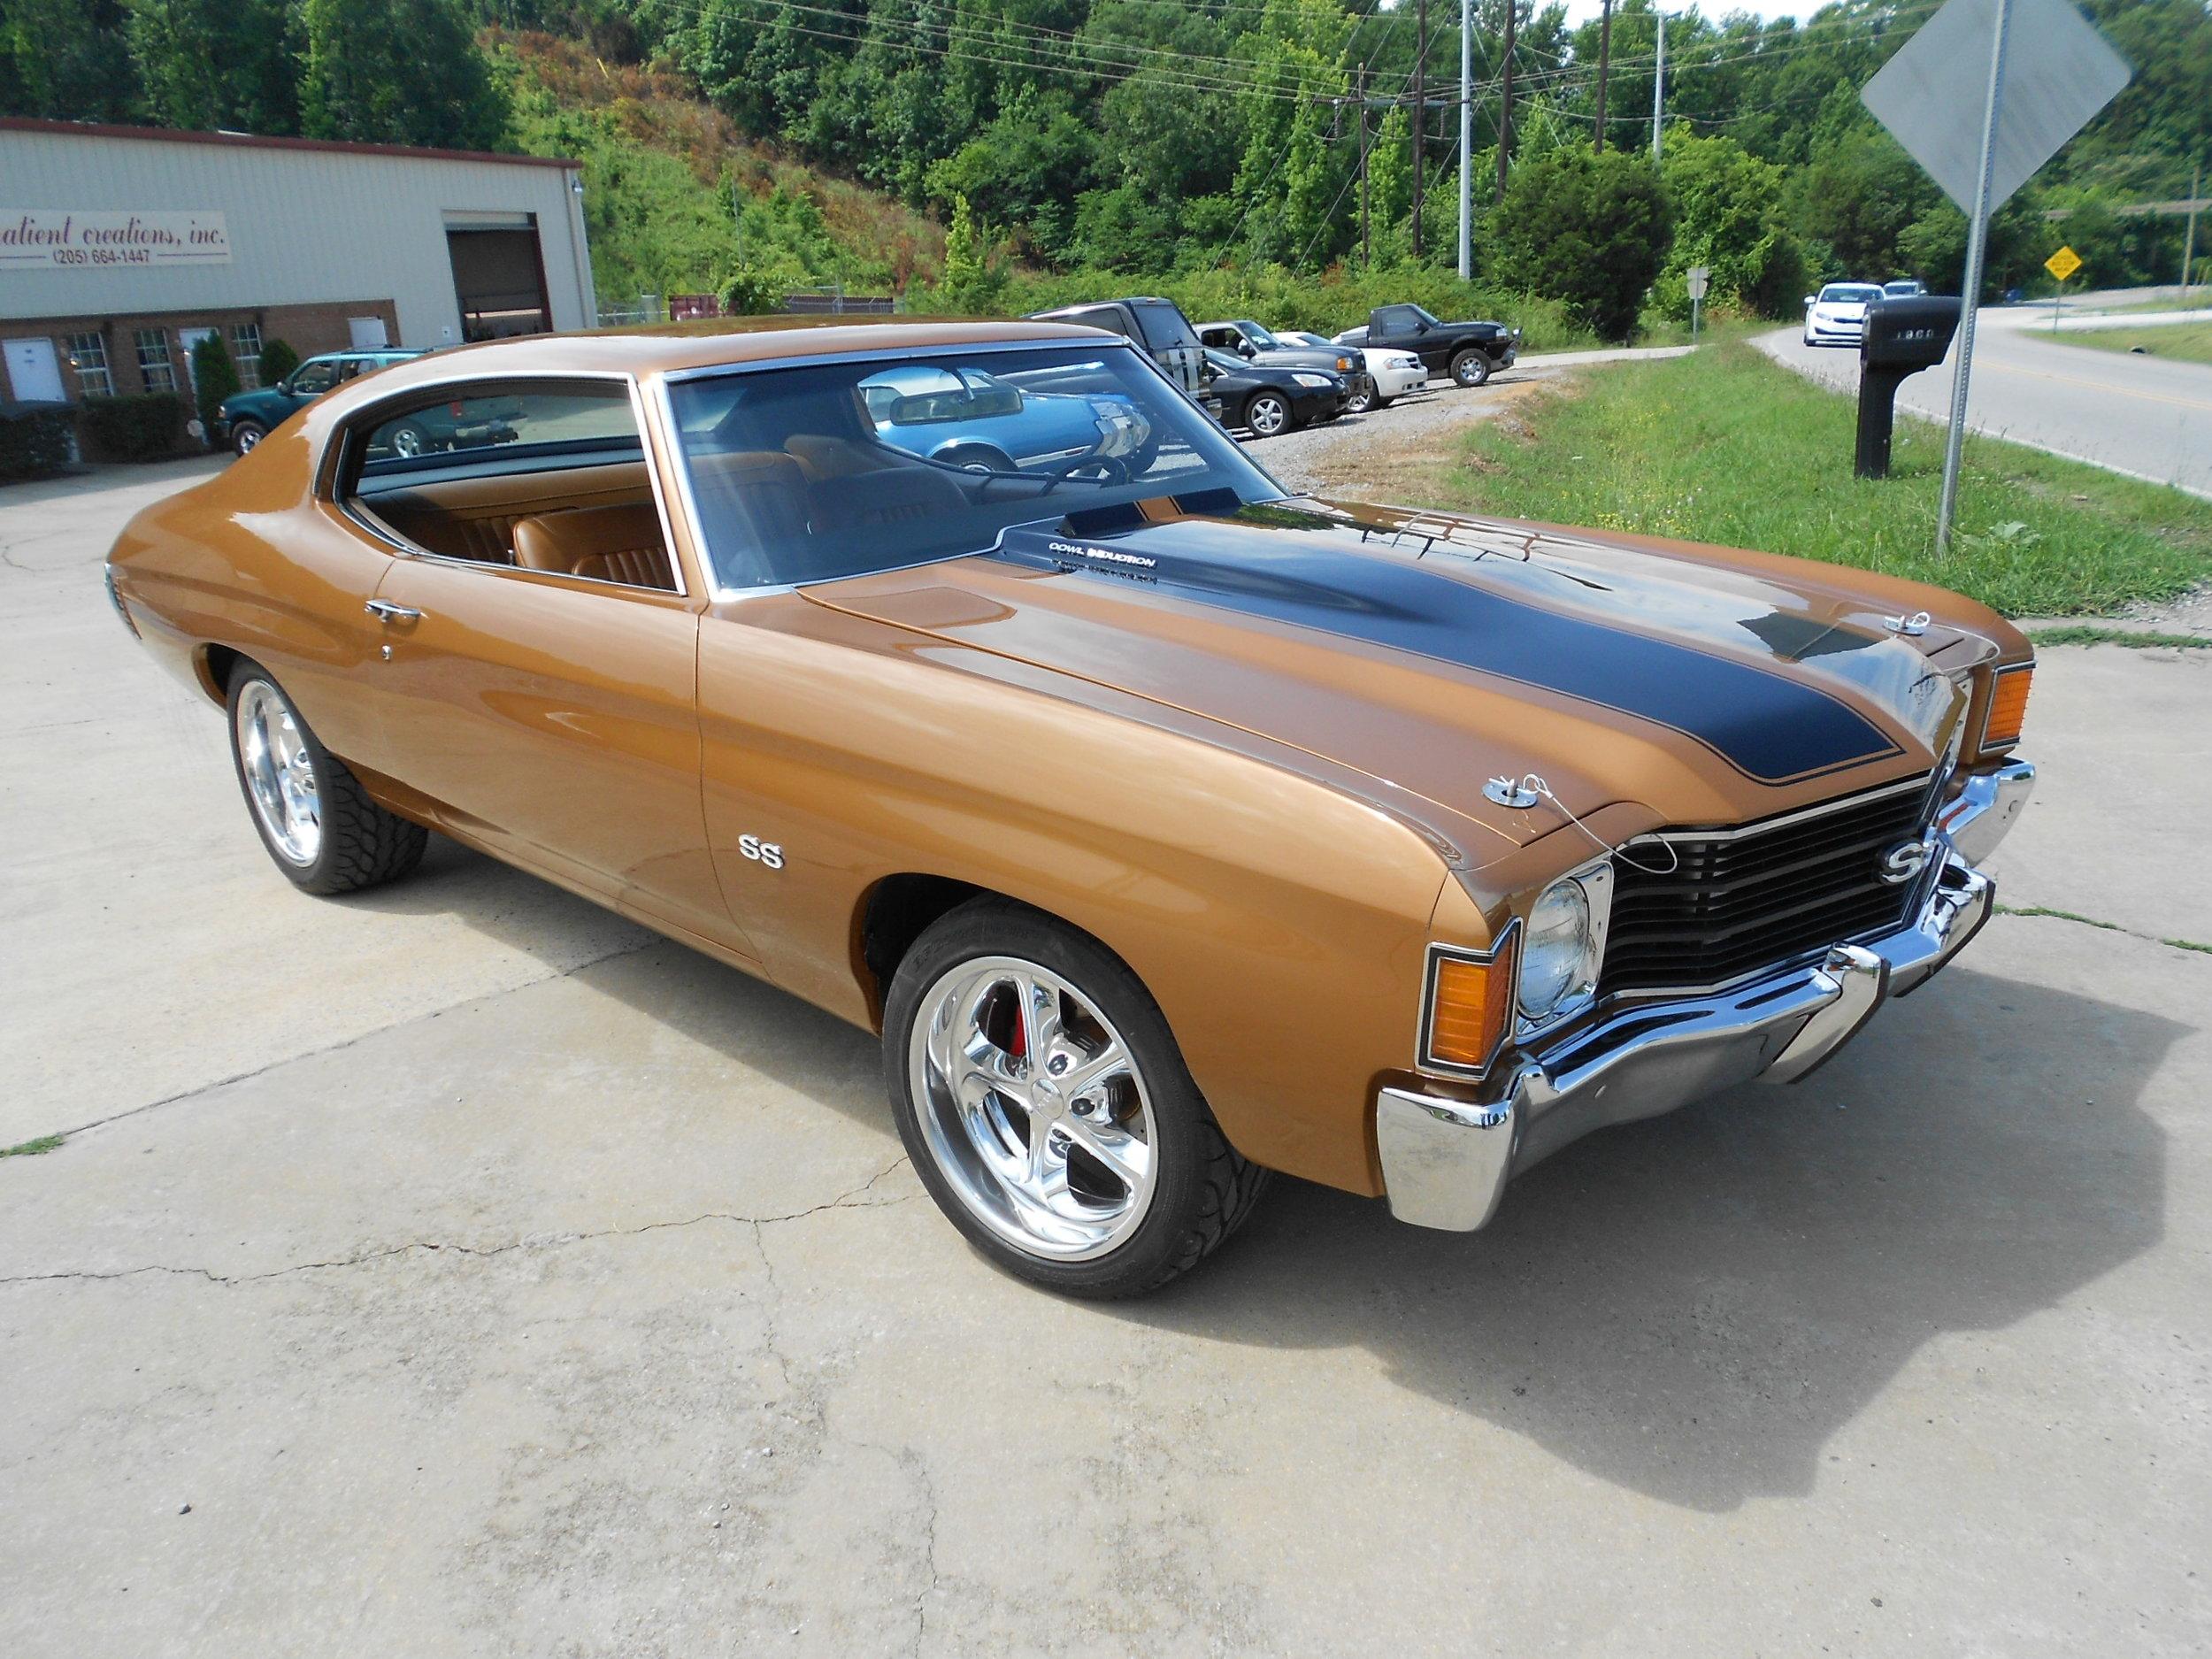 1972 Chevelle -